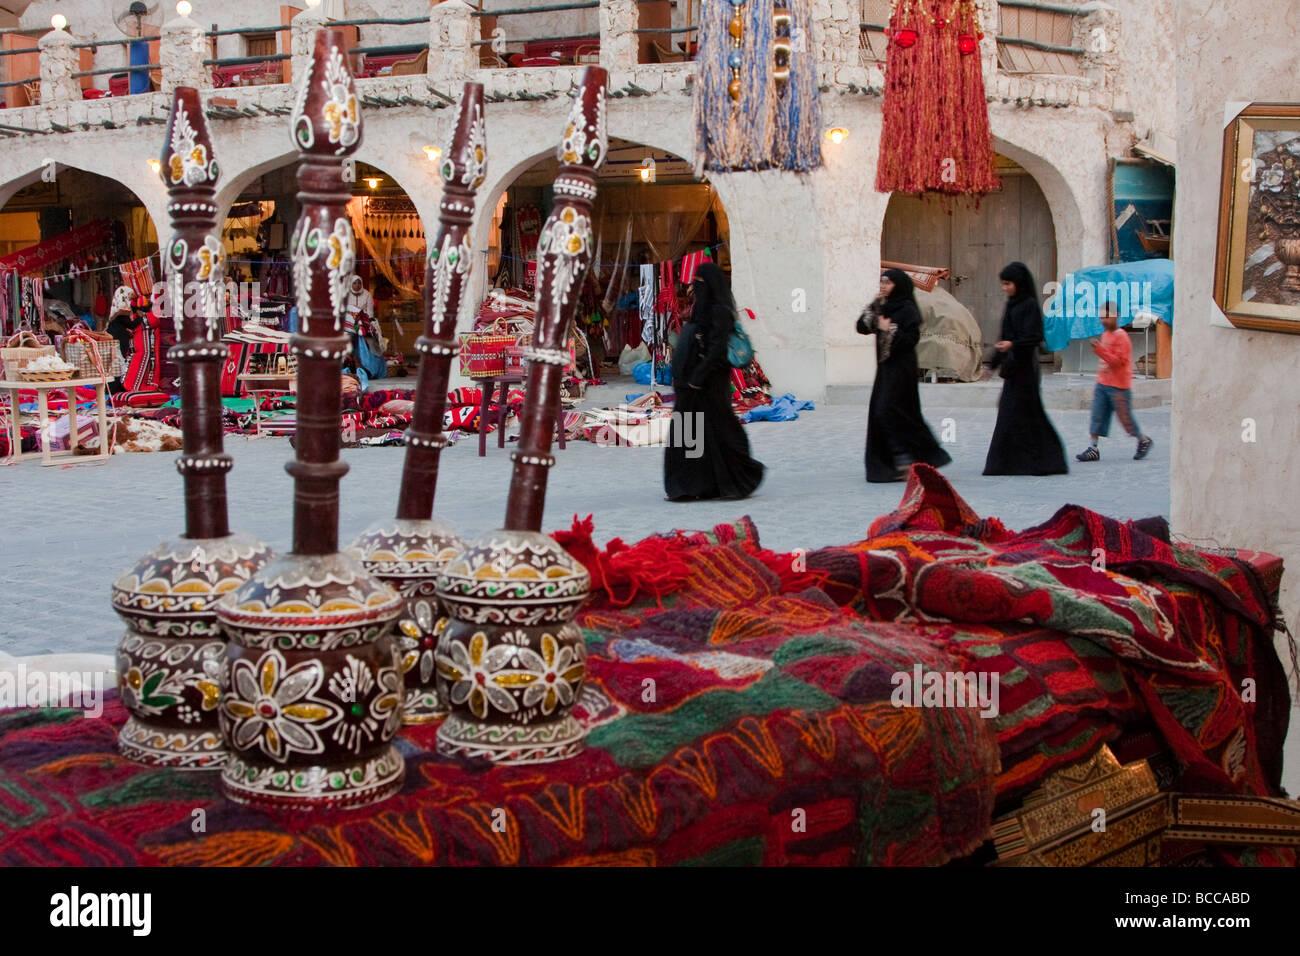 Doha, Qatar.  Market Scene in the Recently Modernized Traditional Market. Qatari Women in Abayas. Stock Photo